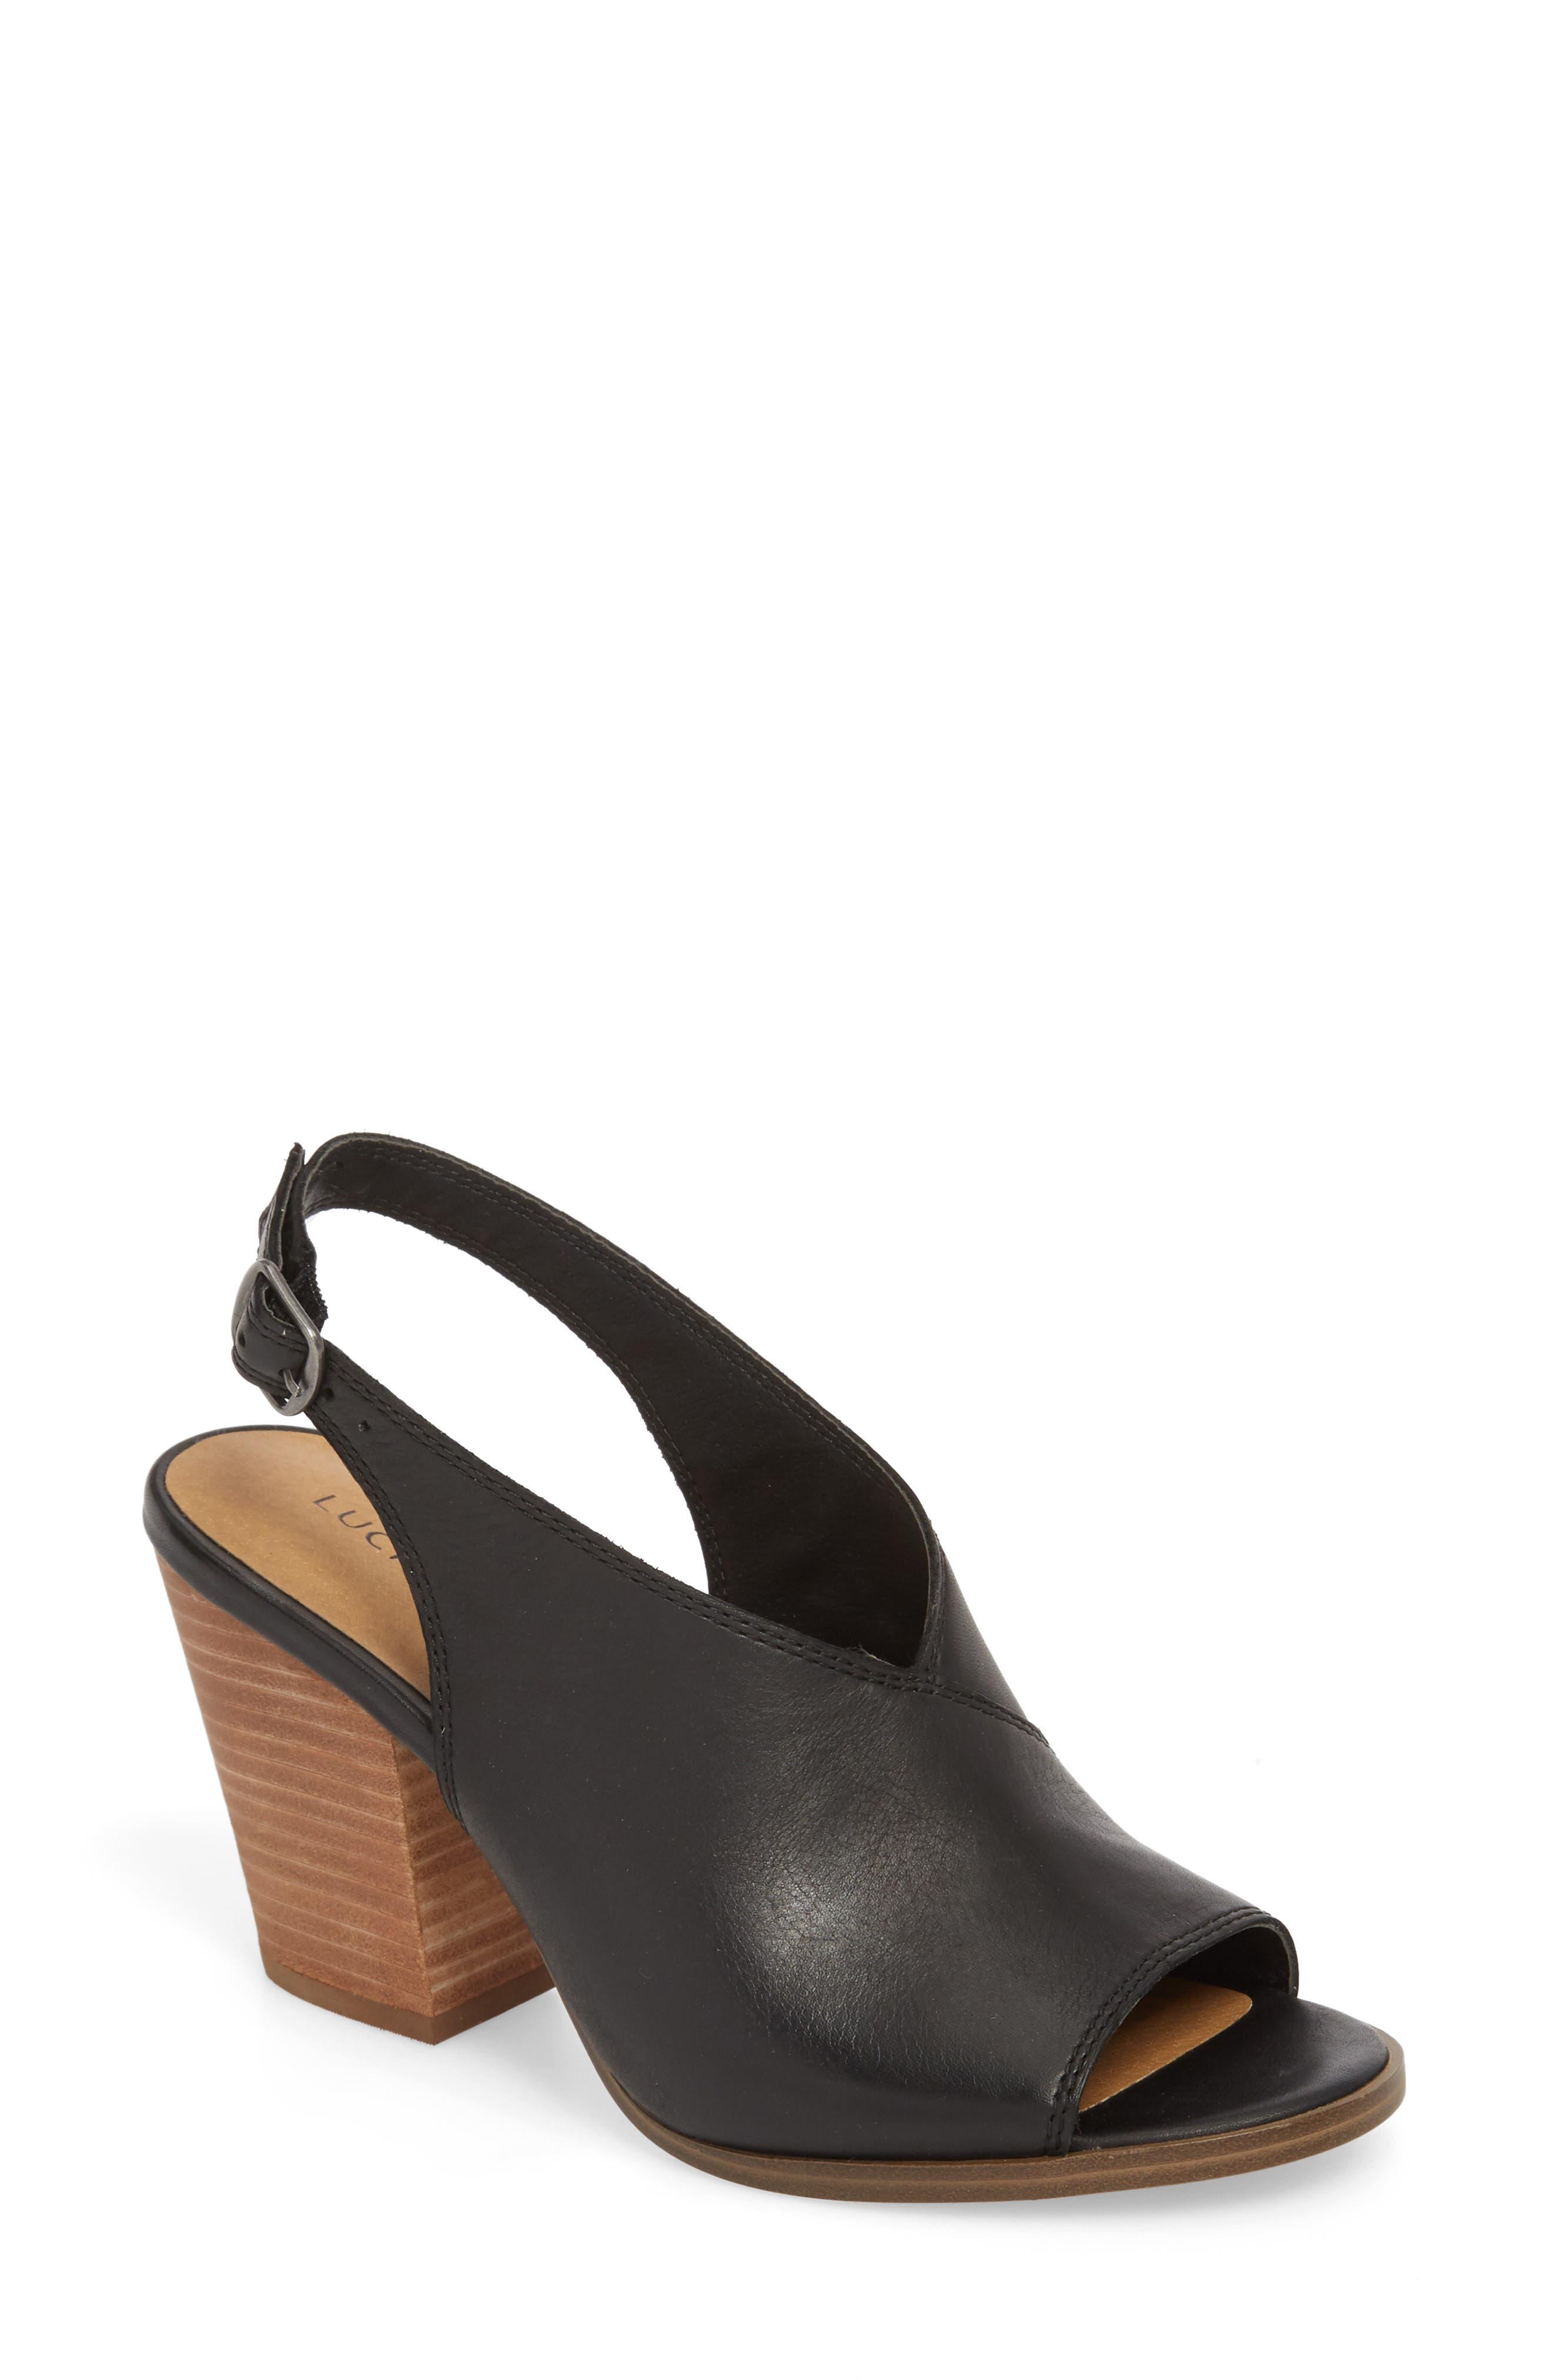 Ovrandie Sandal,                         Main,                         color, BLACK LEATHER